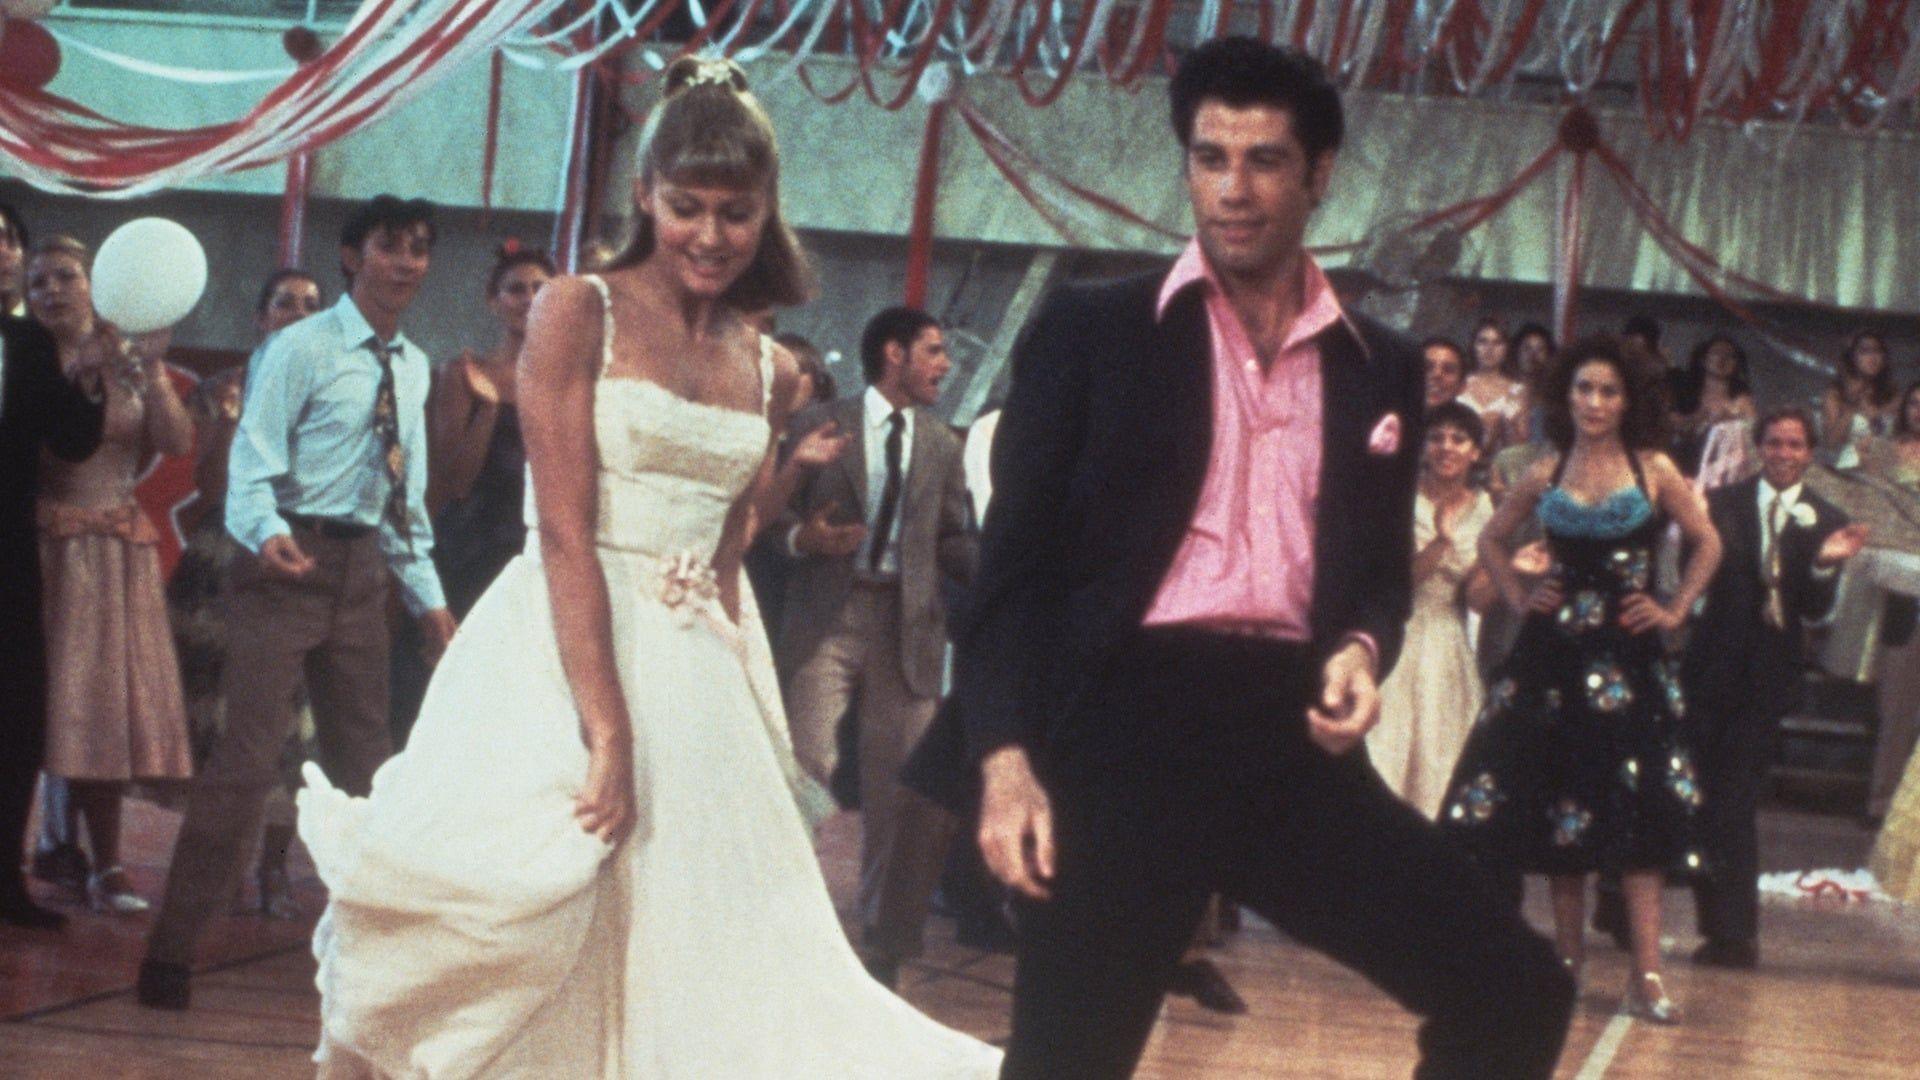 Grease 1978 fuld film online streaming dansk movie123 i